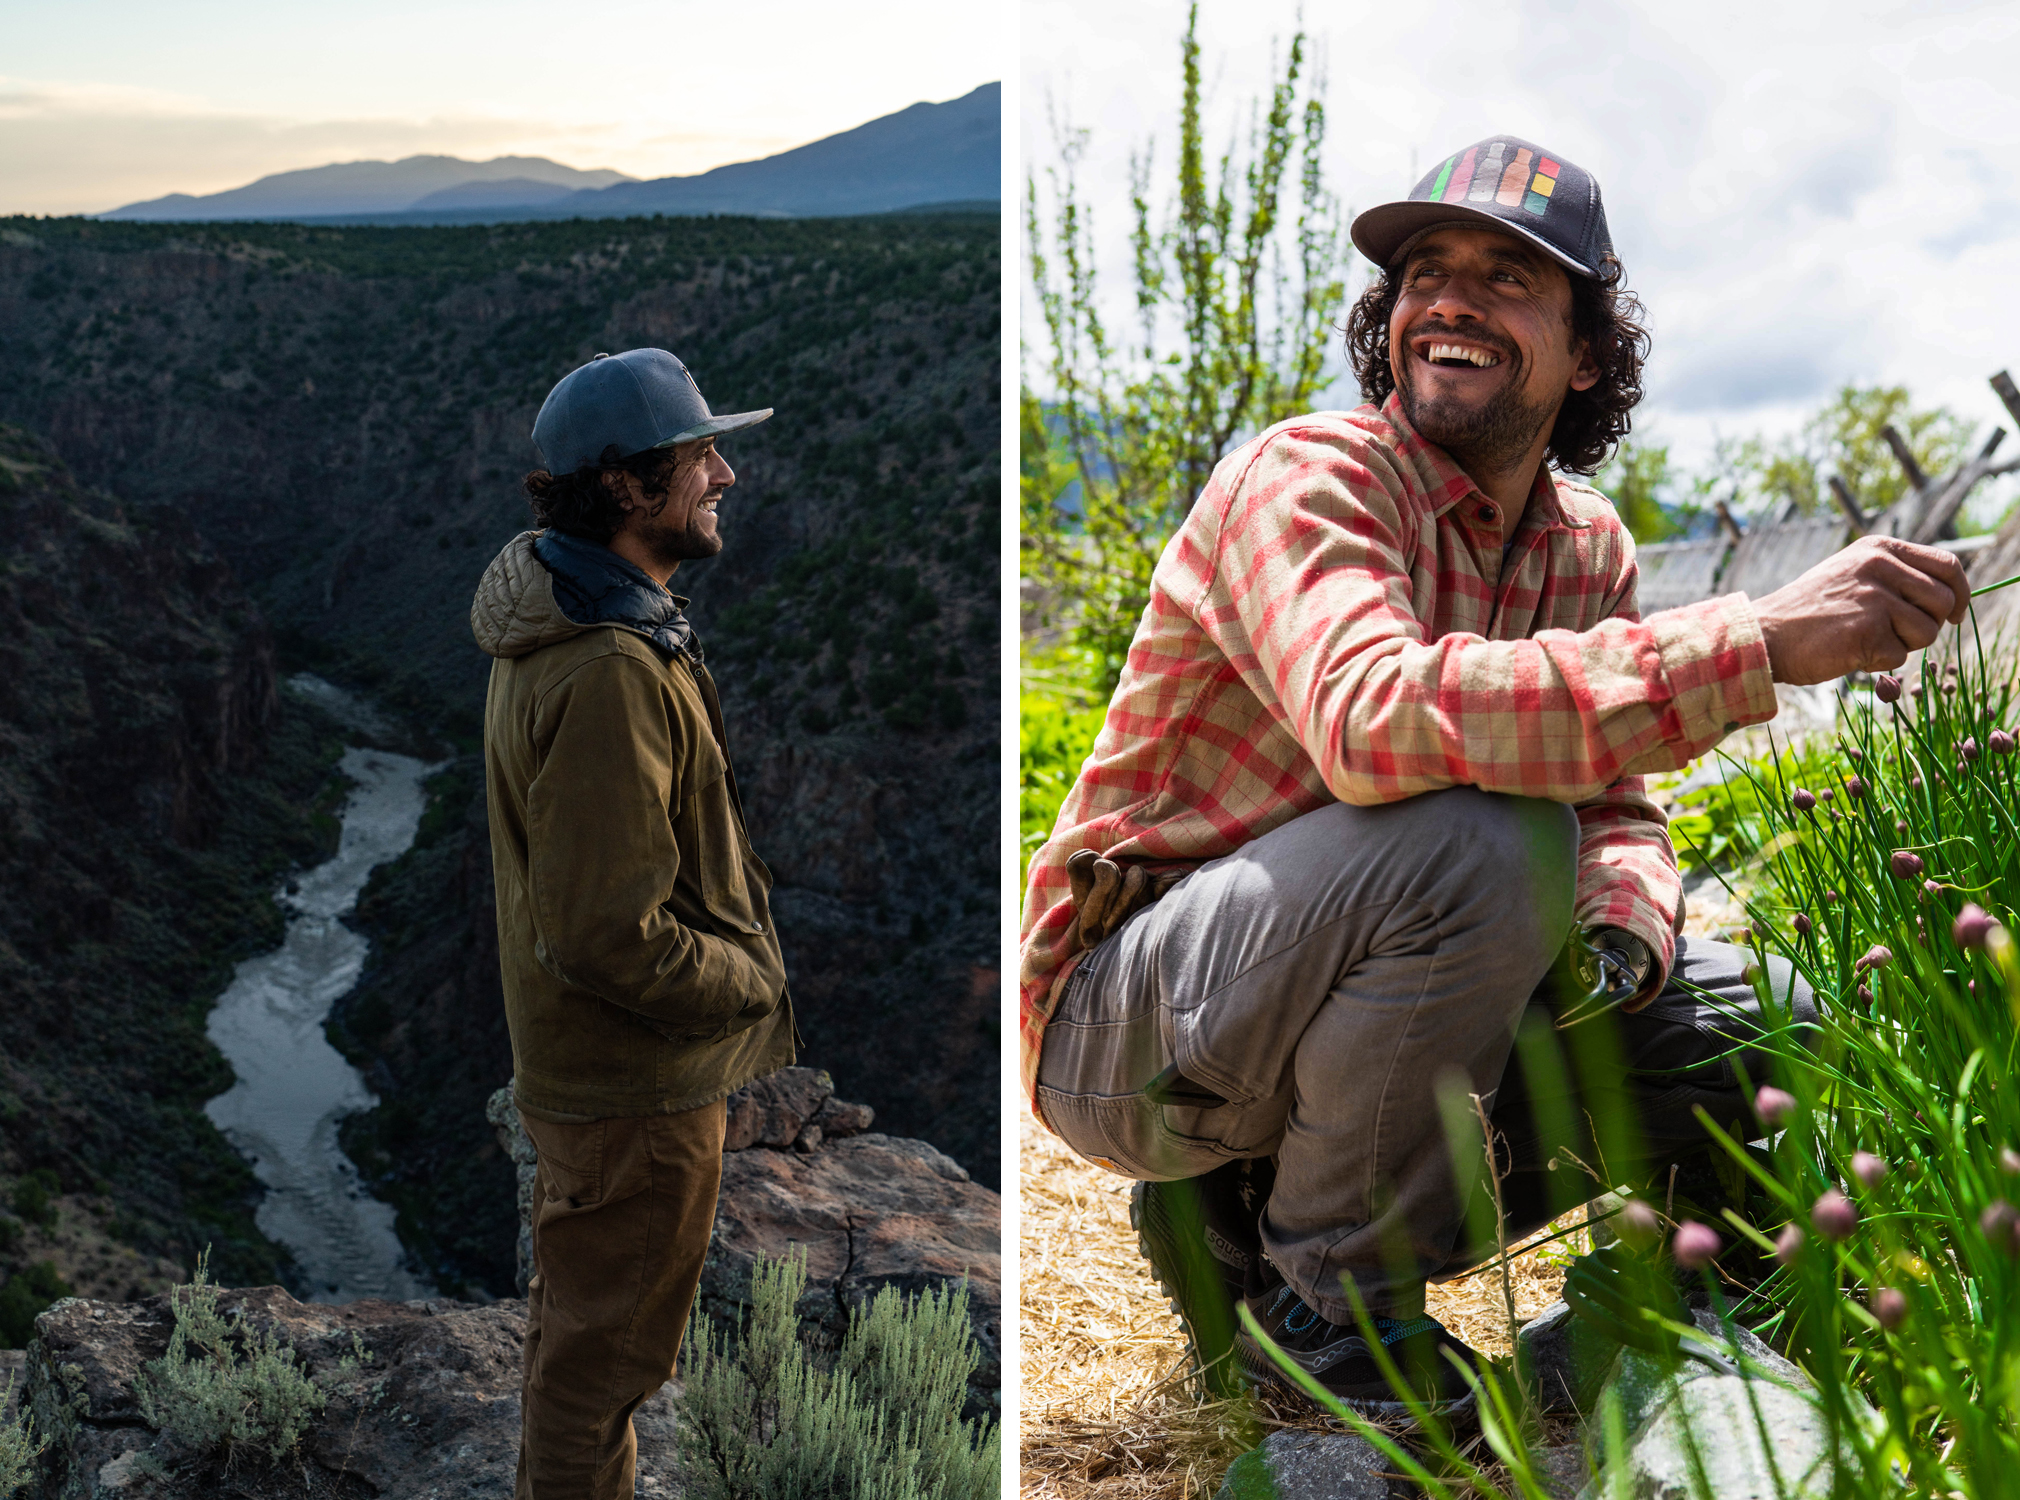 Eduardo Garcia enjoying fresh air in Montana and New Mexico